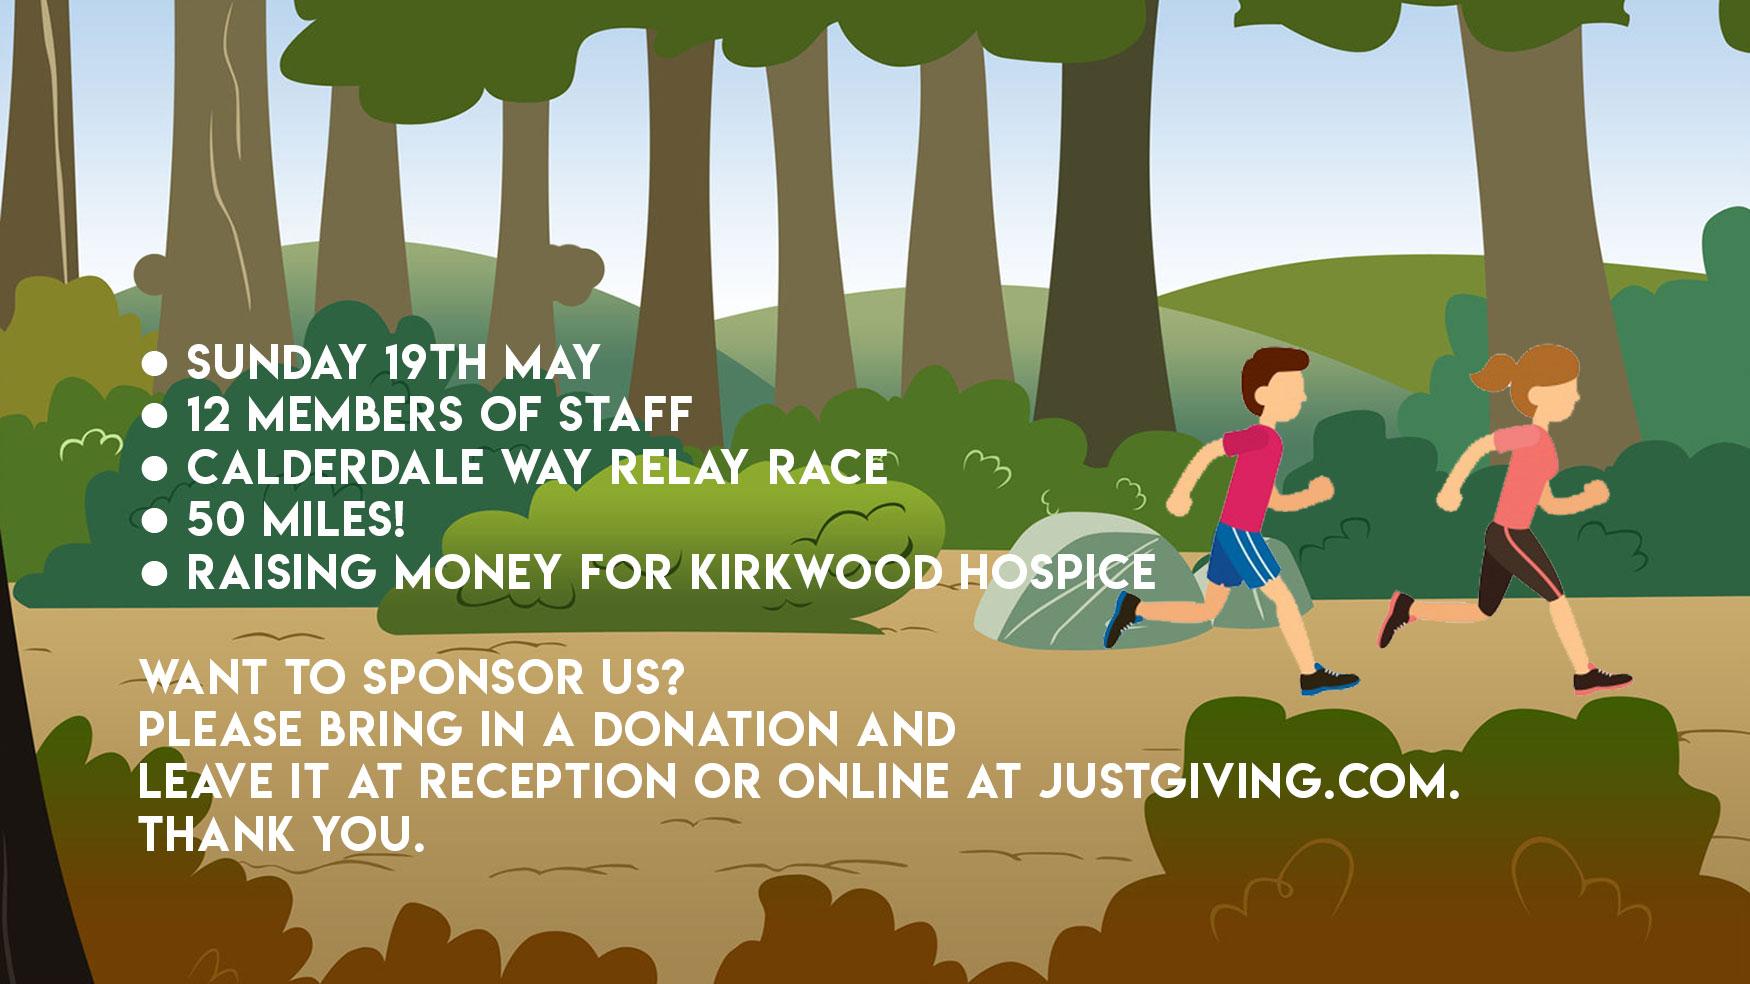 Calderdale Way Relay Run £920 raised for Kirkwood Hospice